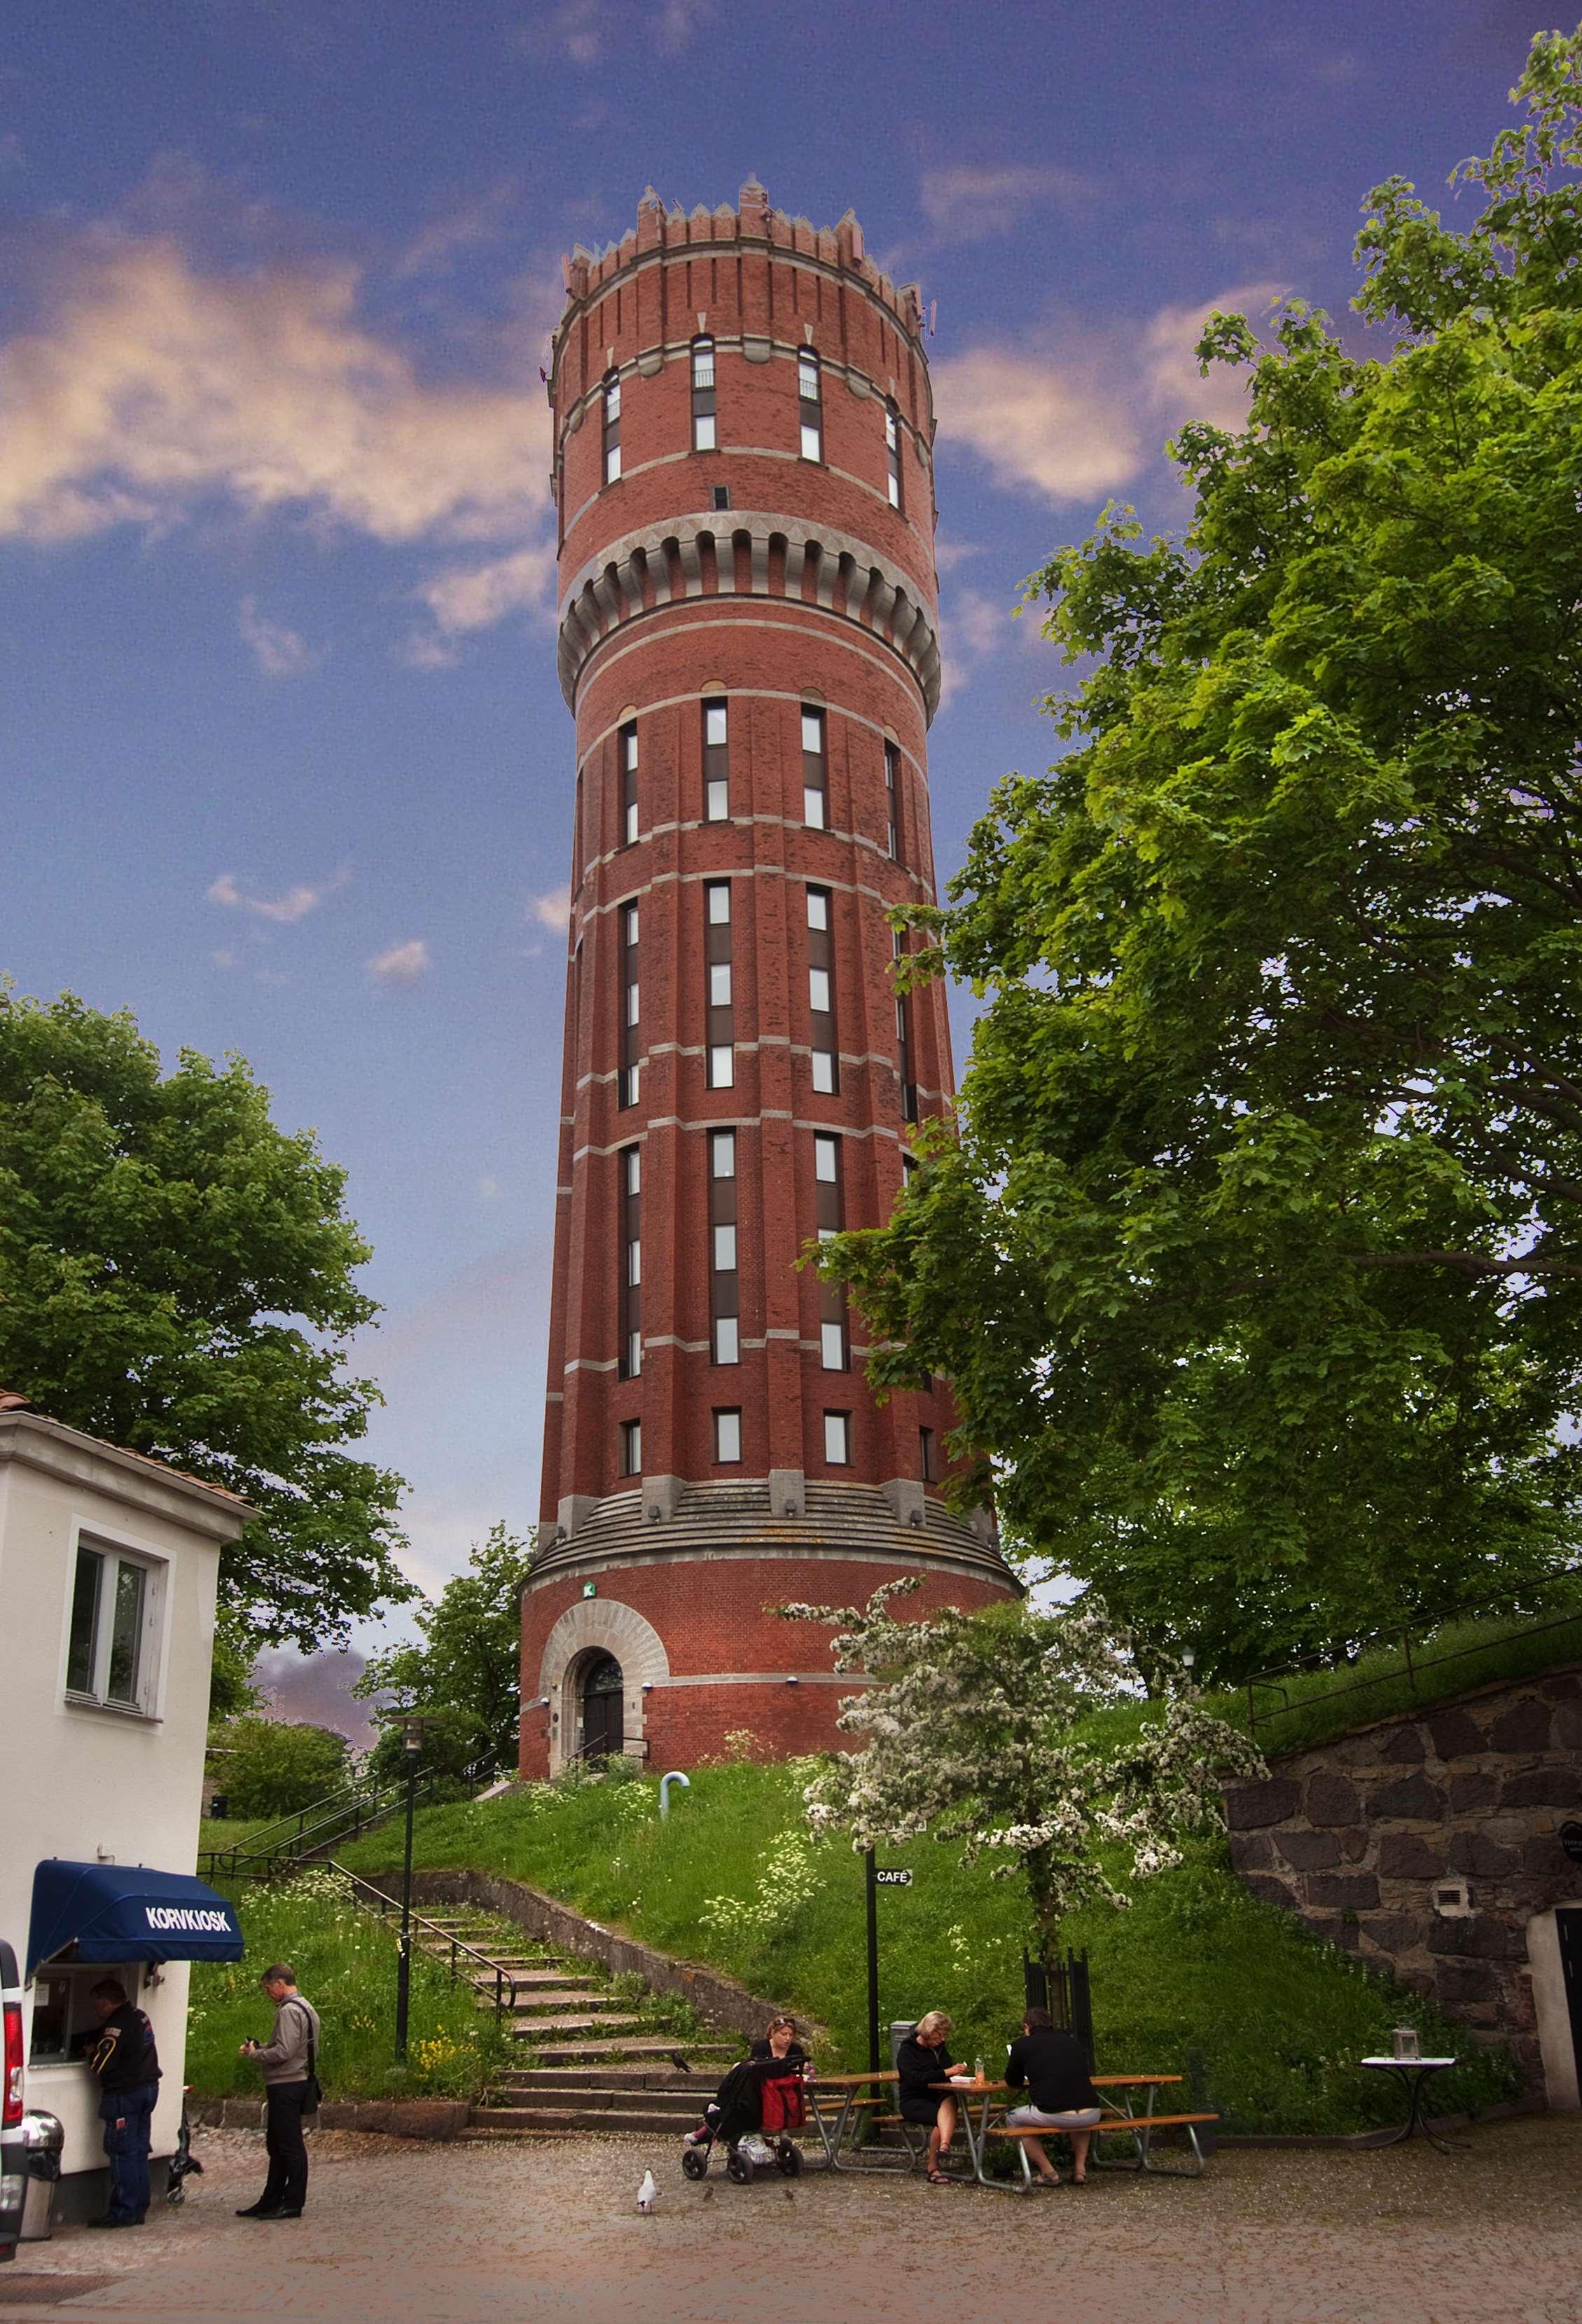 Historical Watertower